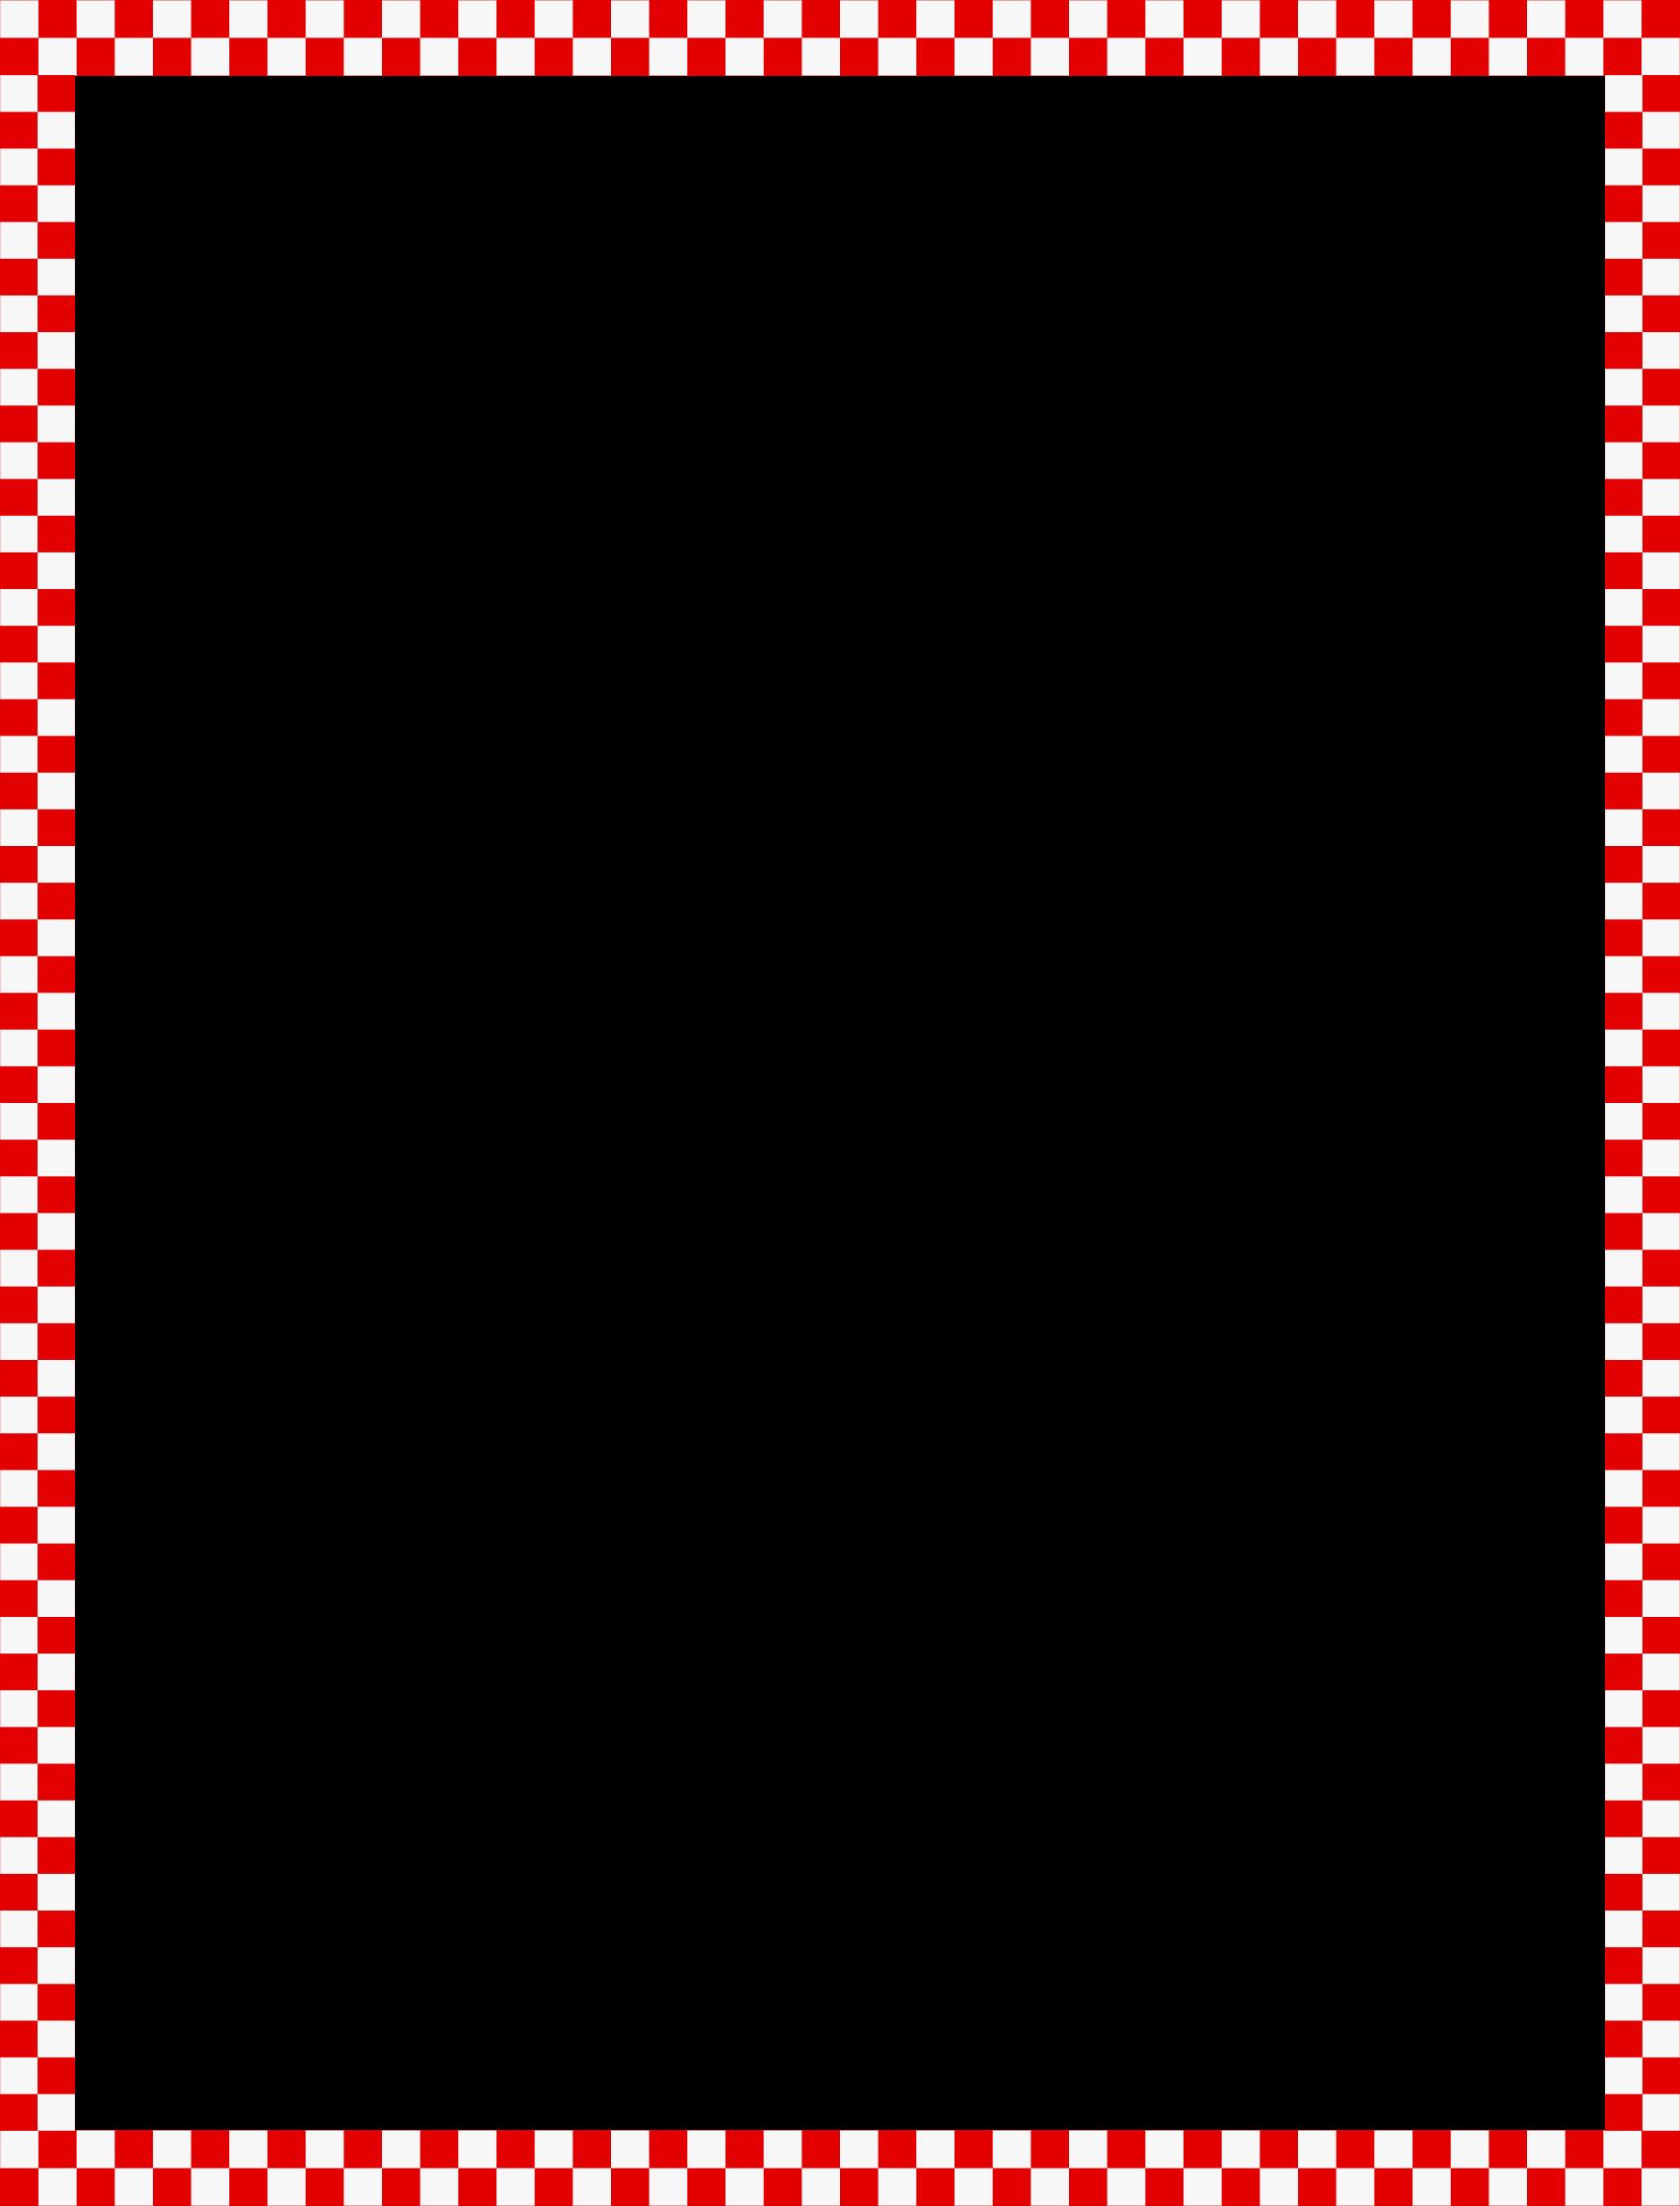 avira tray icon entfernen fHaQrY